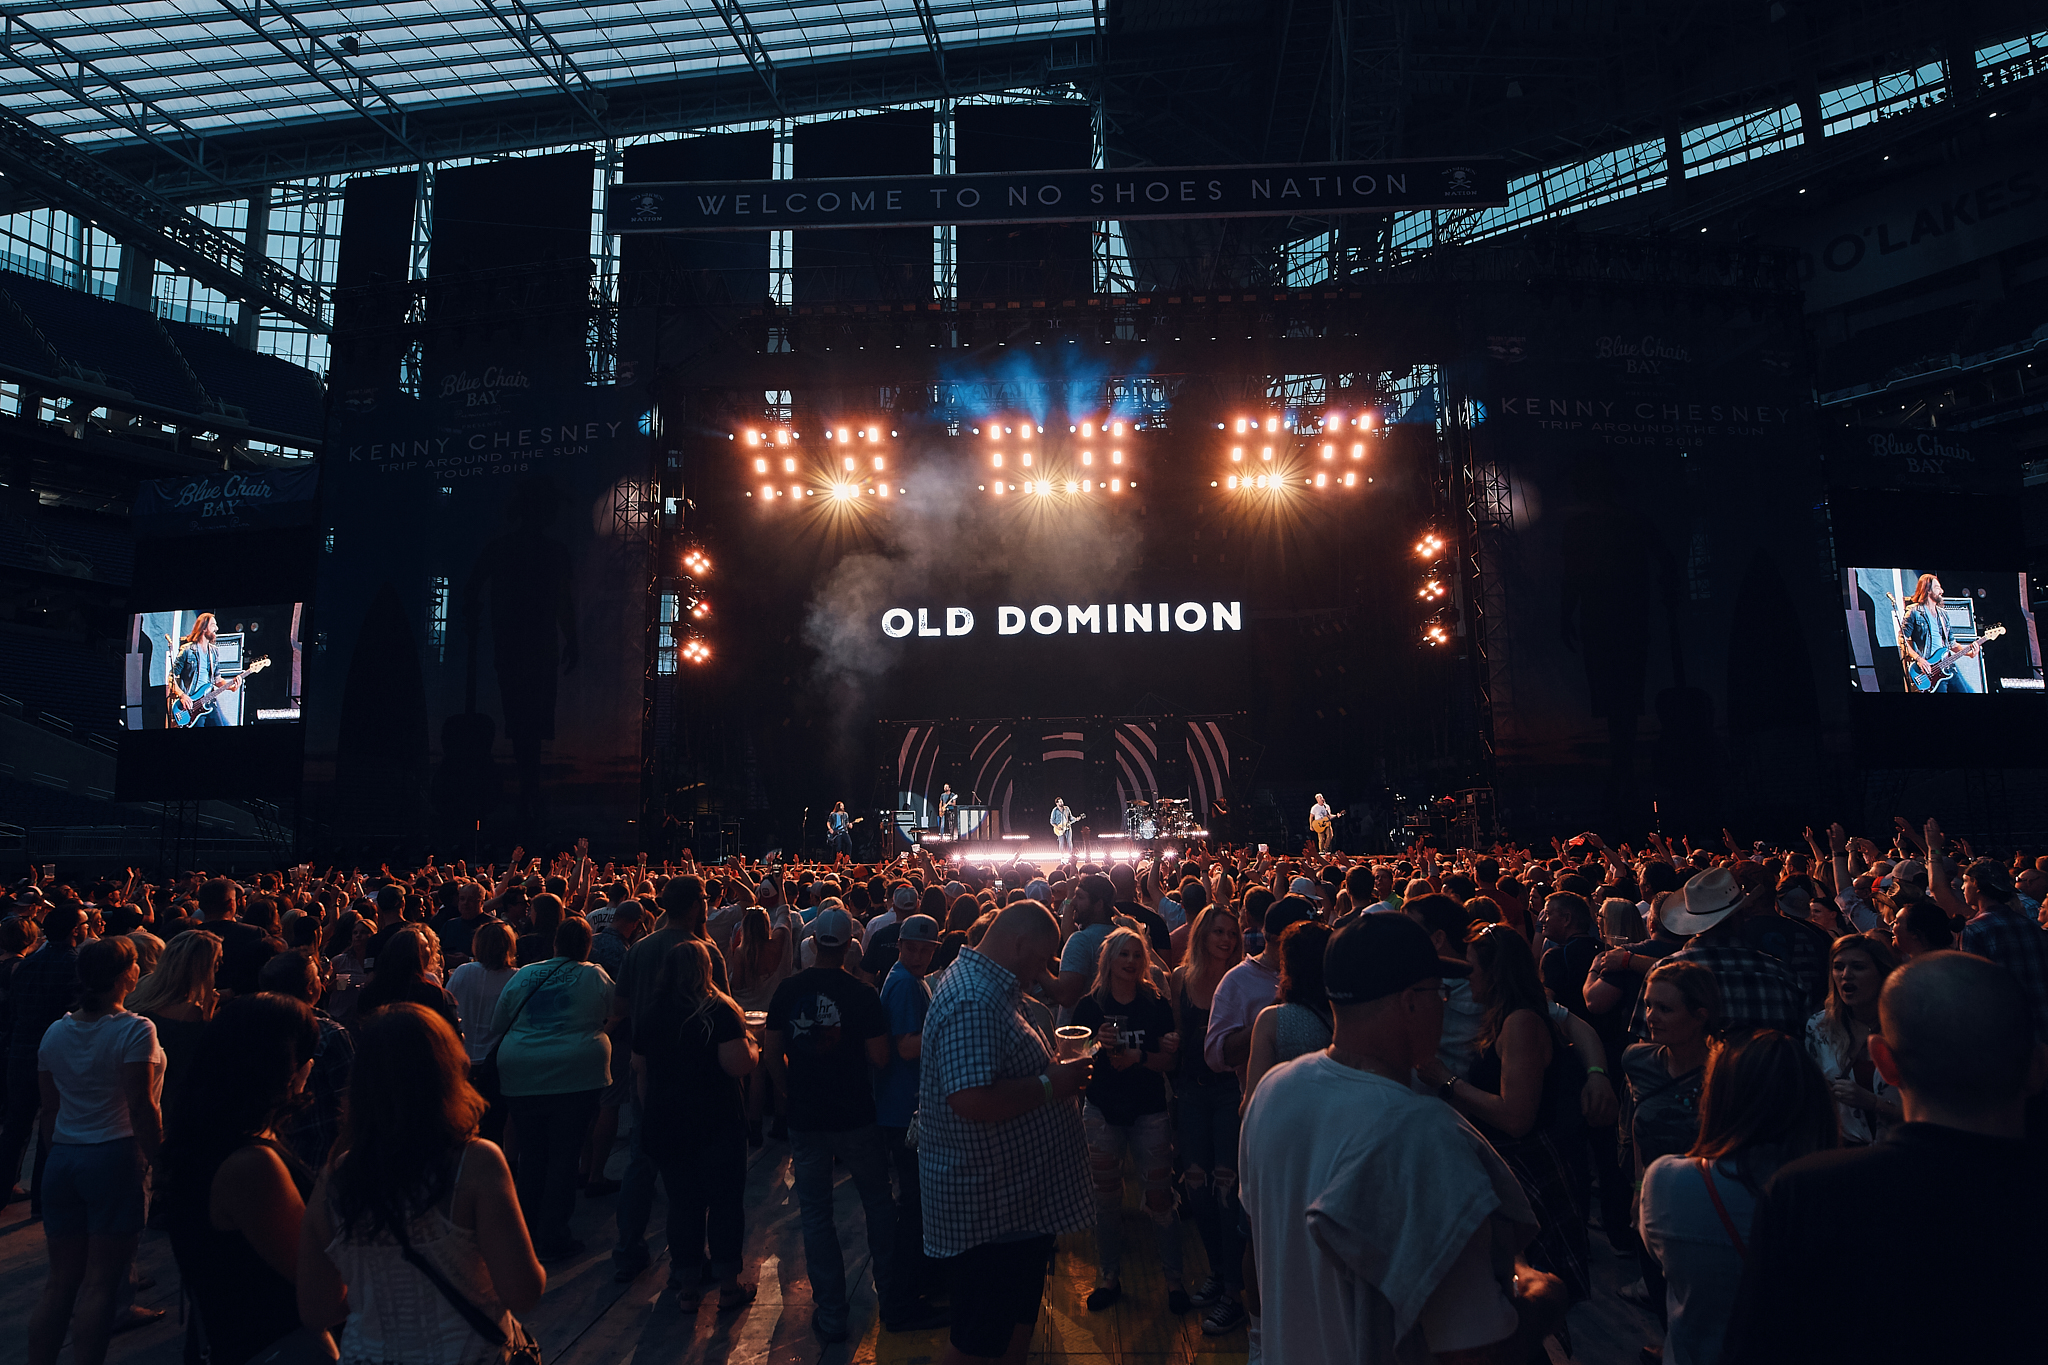 Old_Dominion_At_US_Bank_Stadium_On_05-05-2018_Photo_By_Joe_Lemke_002.jpg